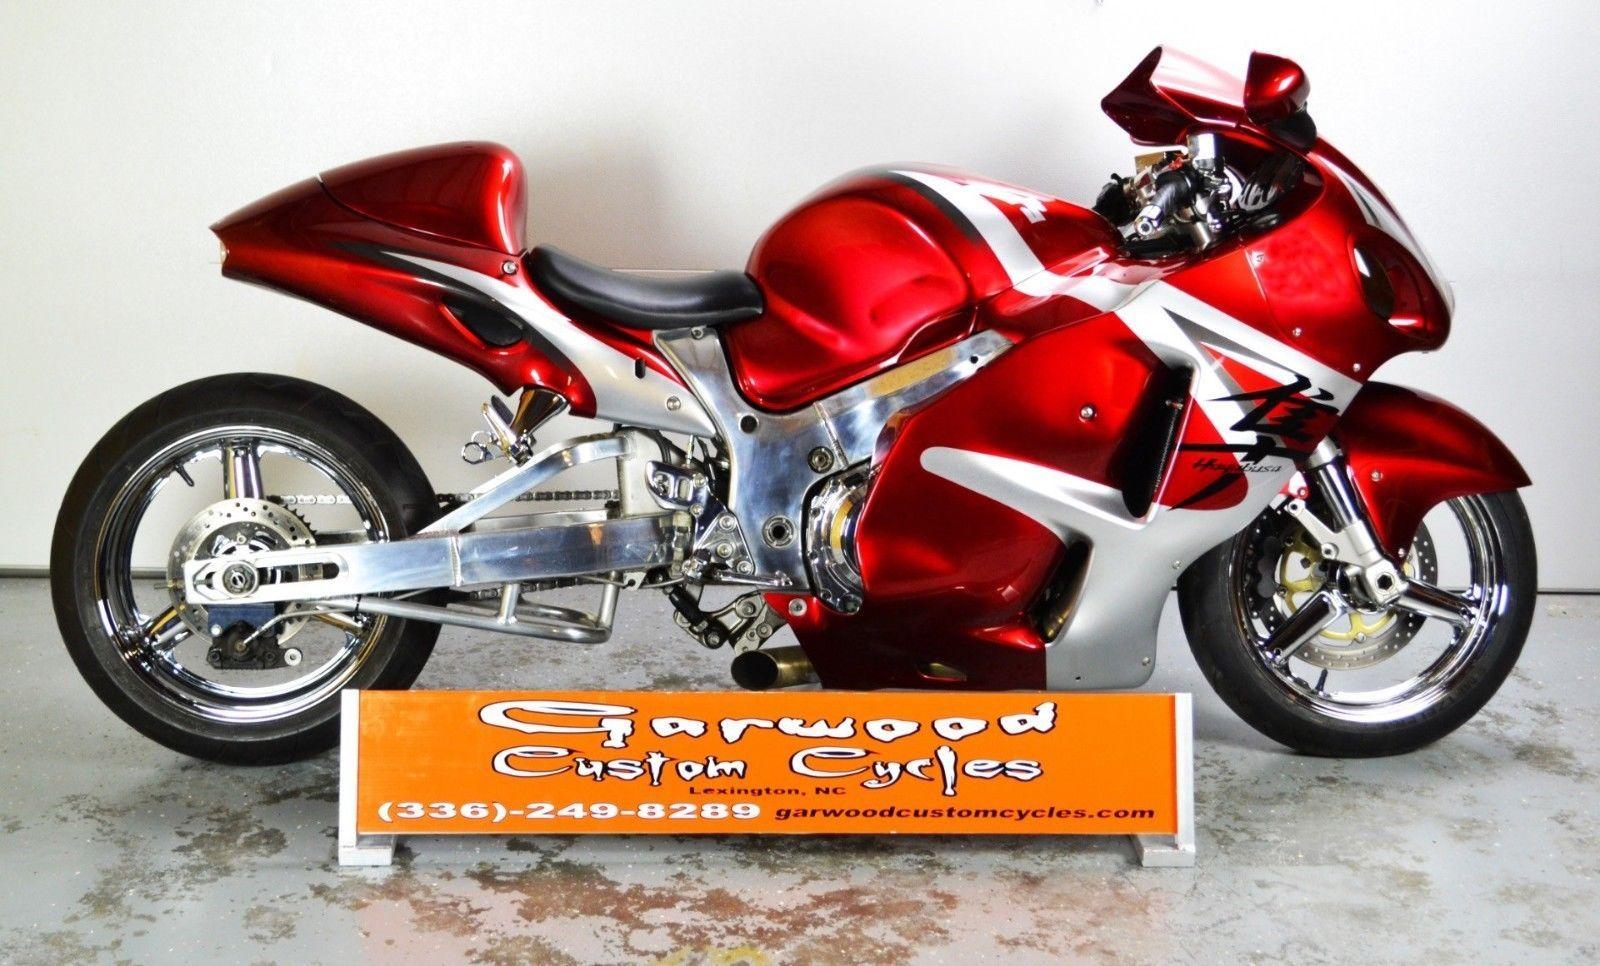 2018 suzuki hayabusa turbo.  turbo awesome great 2001 suzuki hayabusa custom w turbo kit  u0026 more 2017 for 2018 suzuki hayabusa turbo